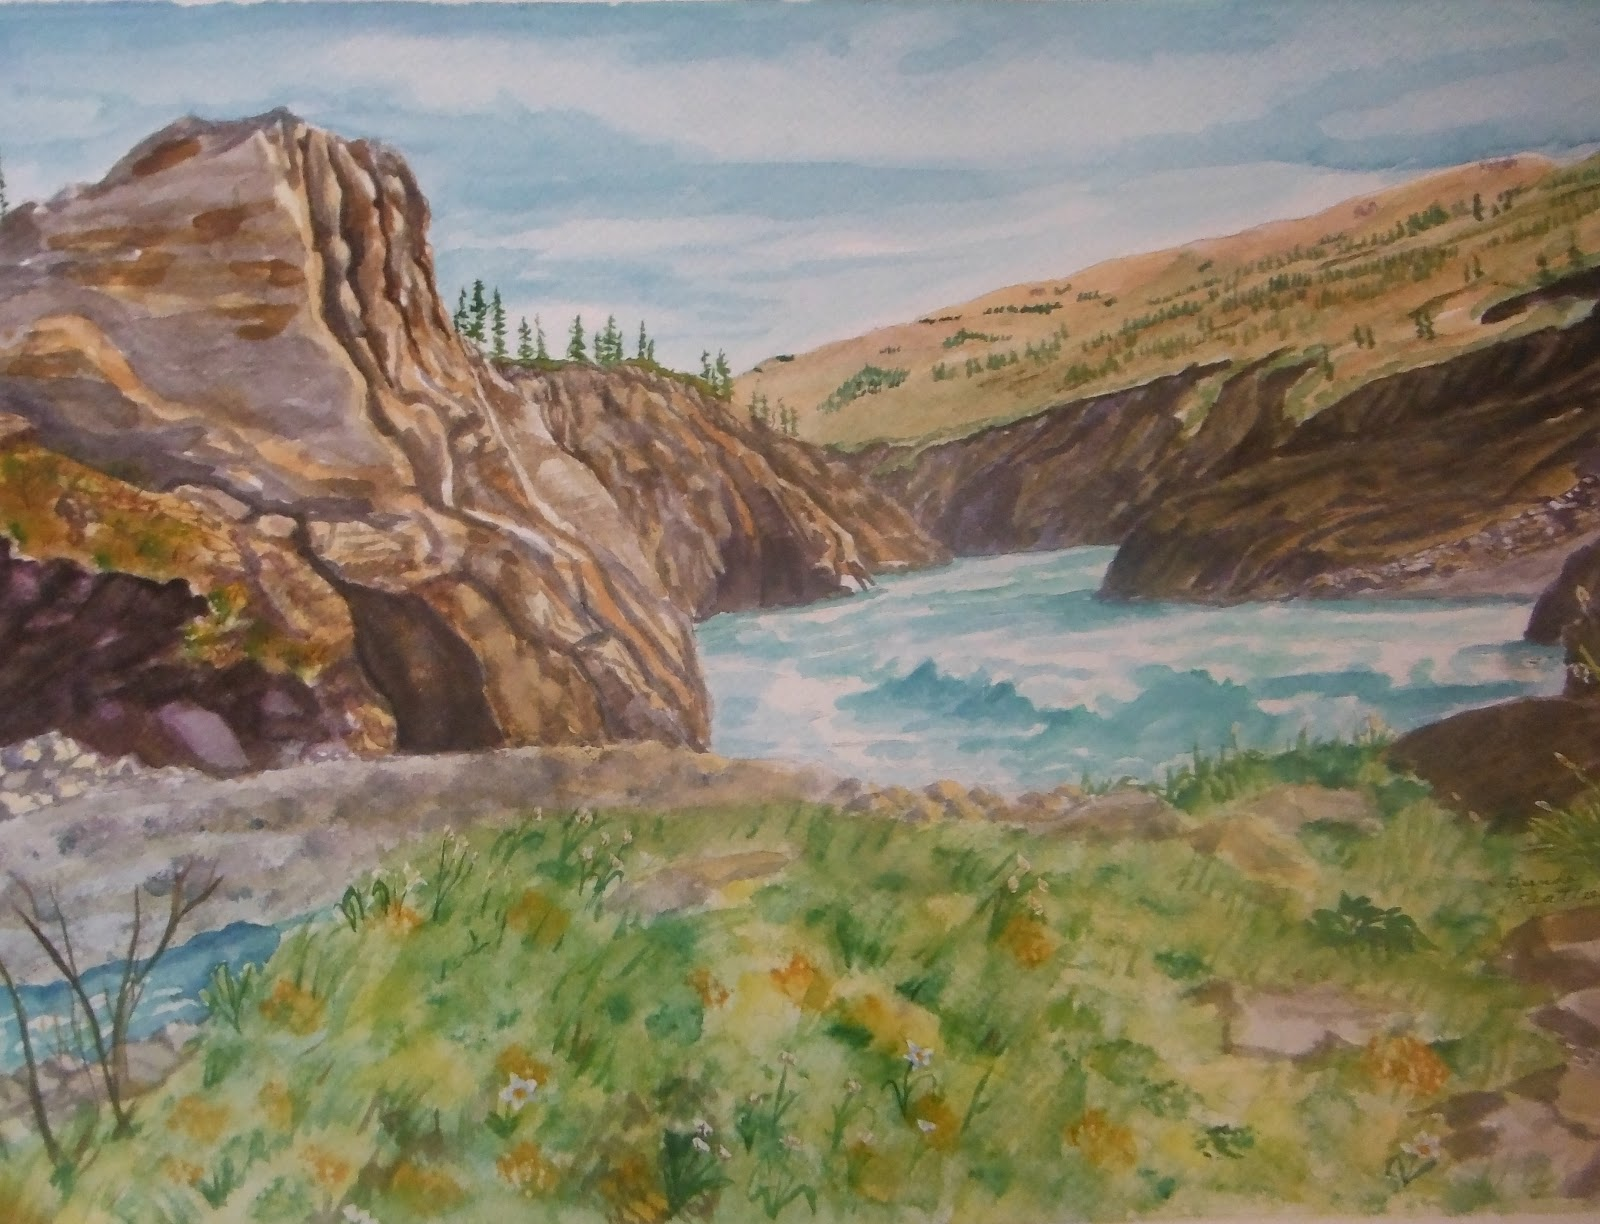 ivvavik national park canada - photo #21